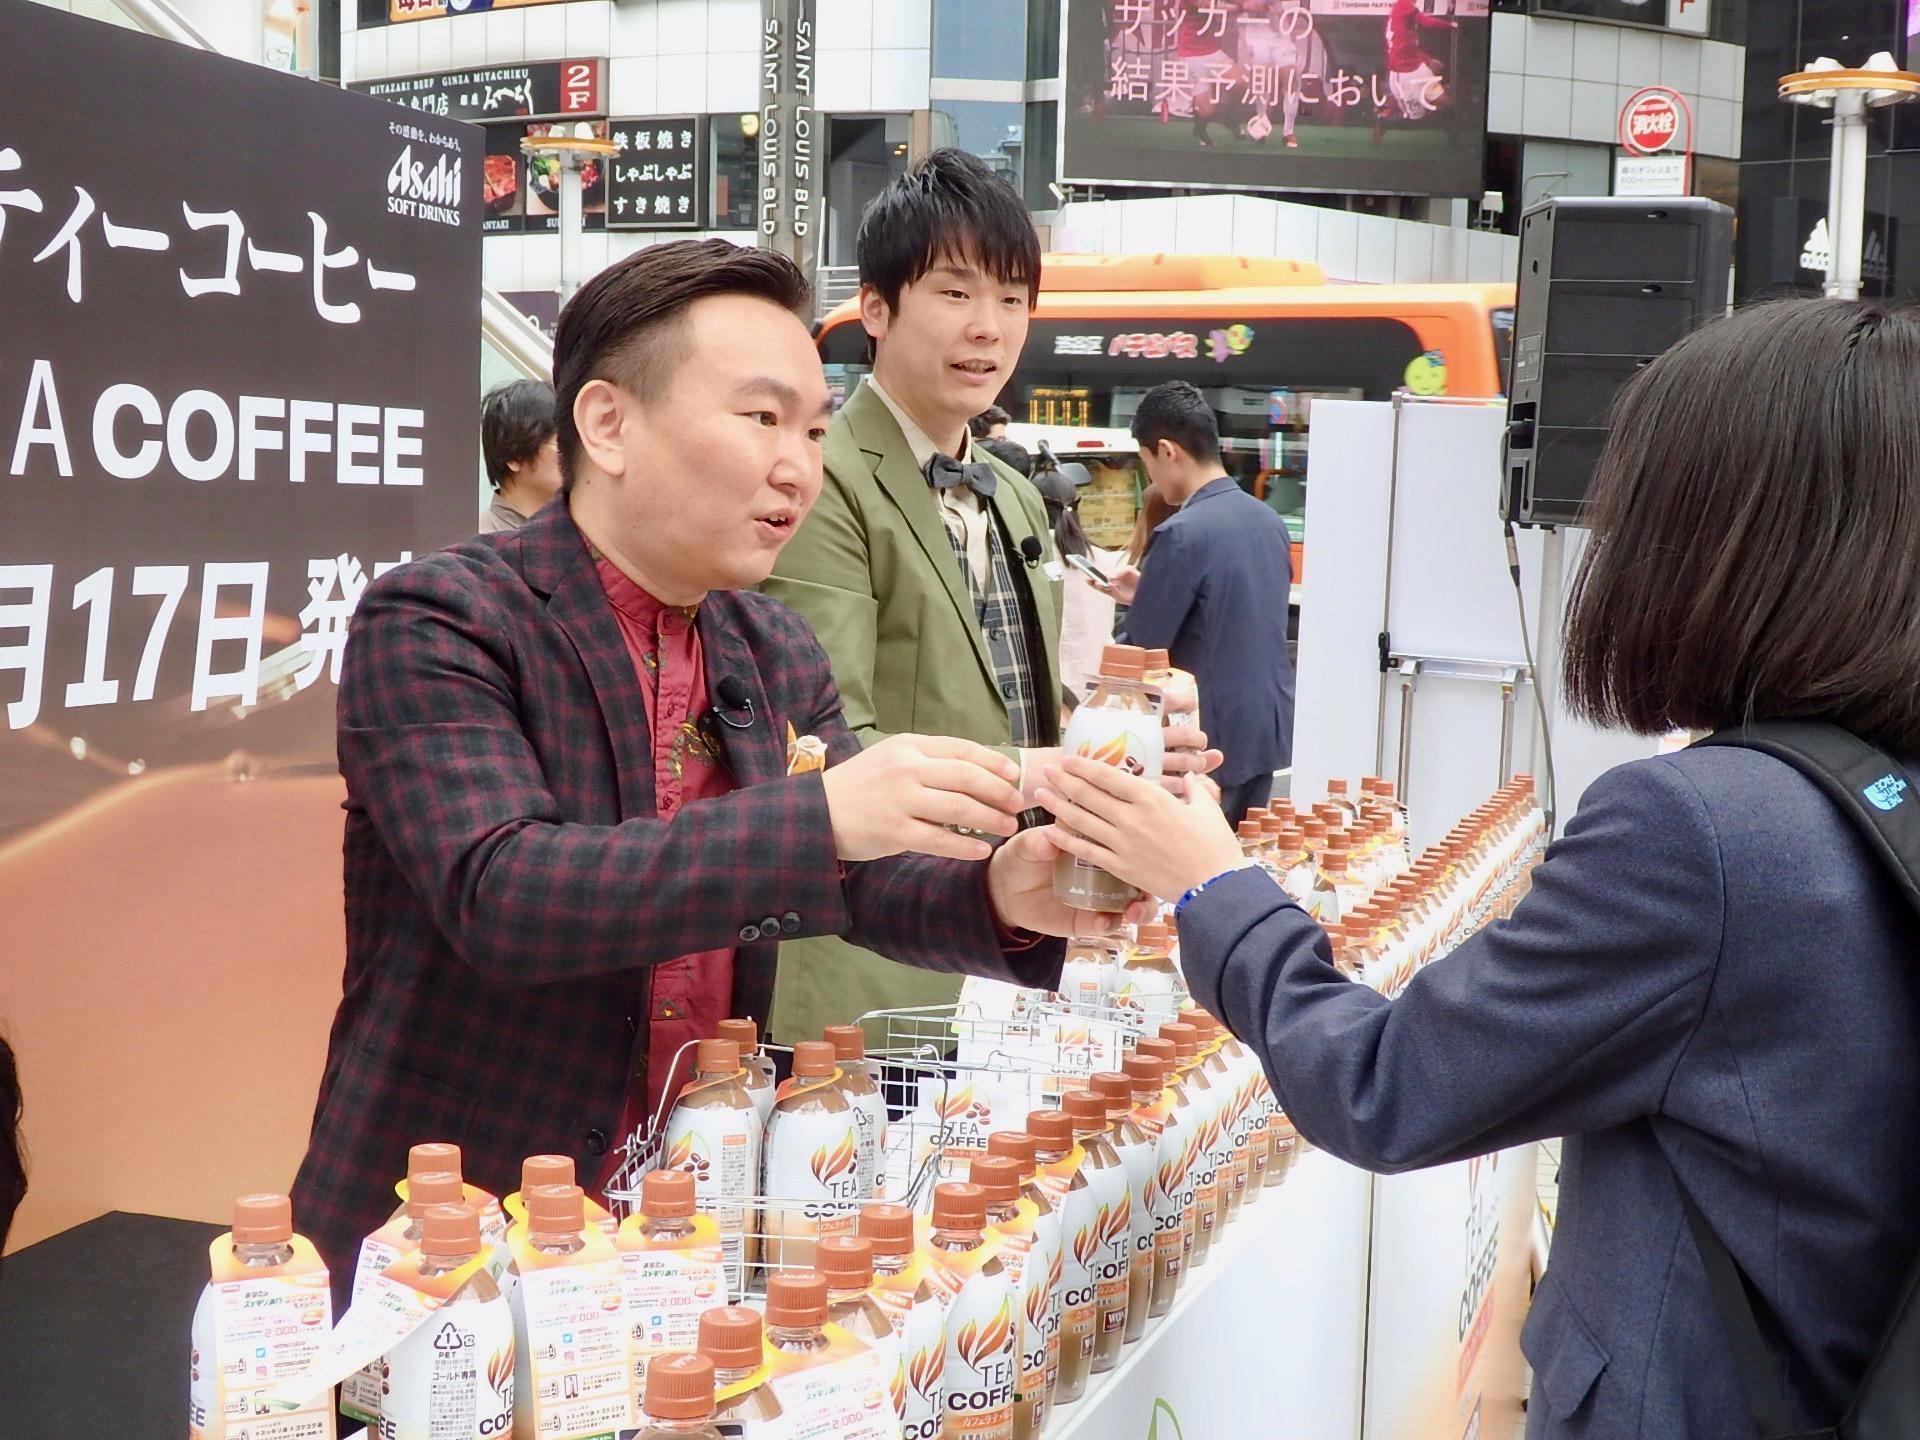 http://news.yoshimoto.co.jp/20180414165224-26da038e5e5824bee1fbb5b719785e47d0823709.jpg